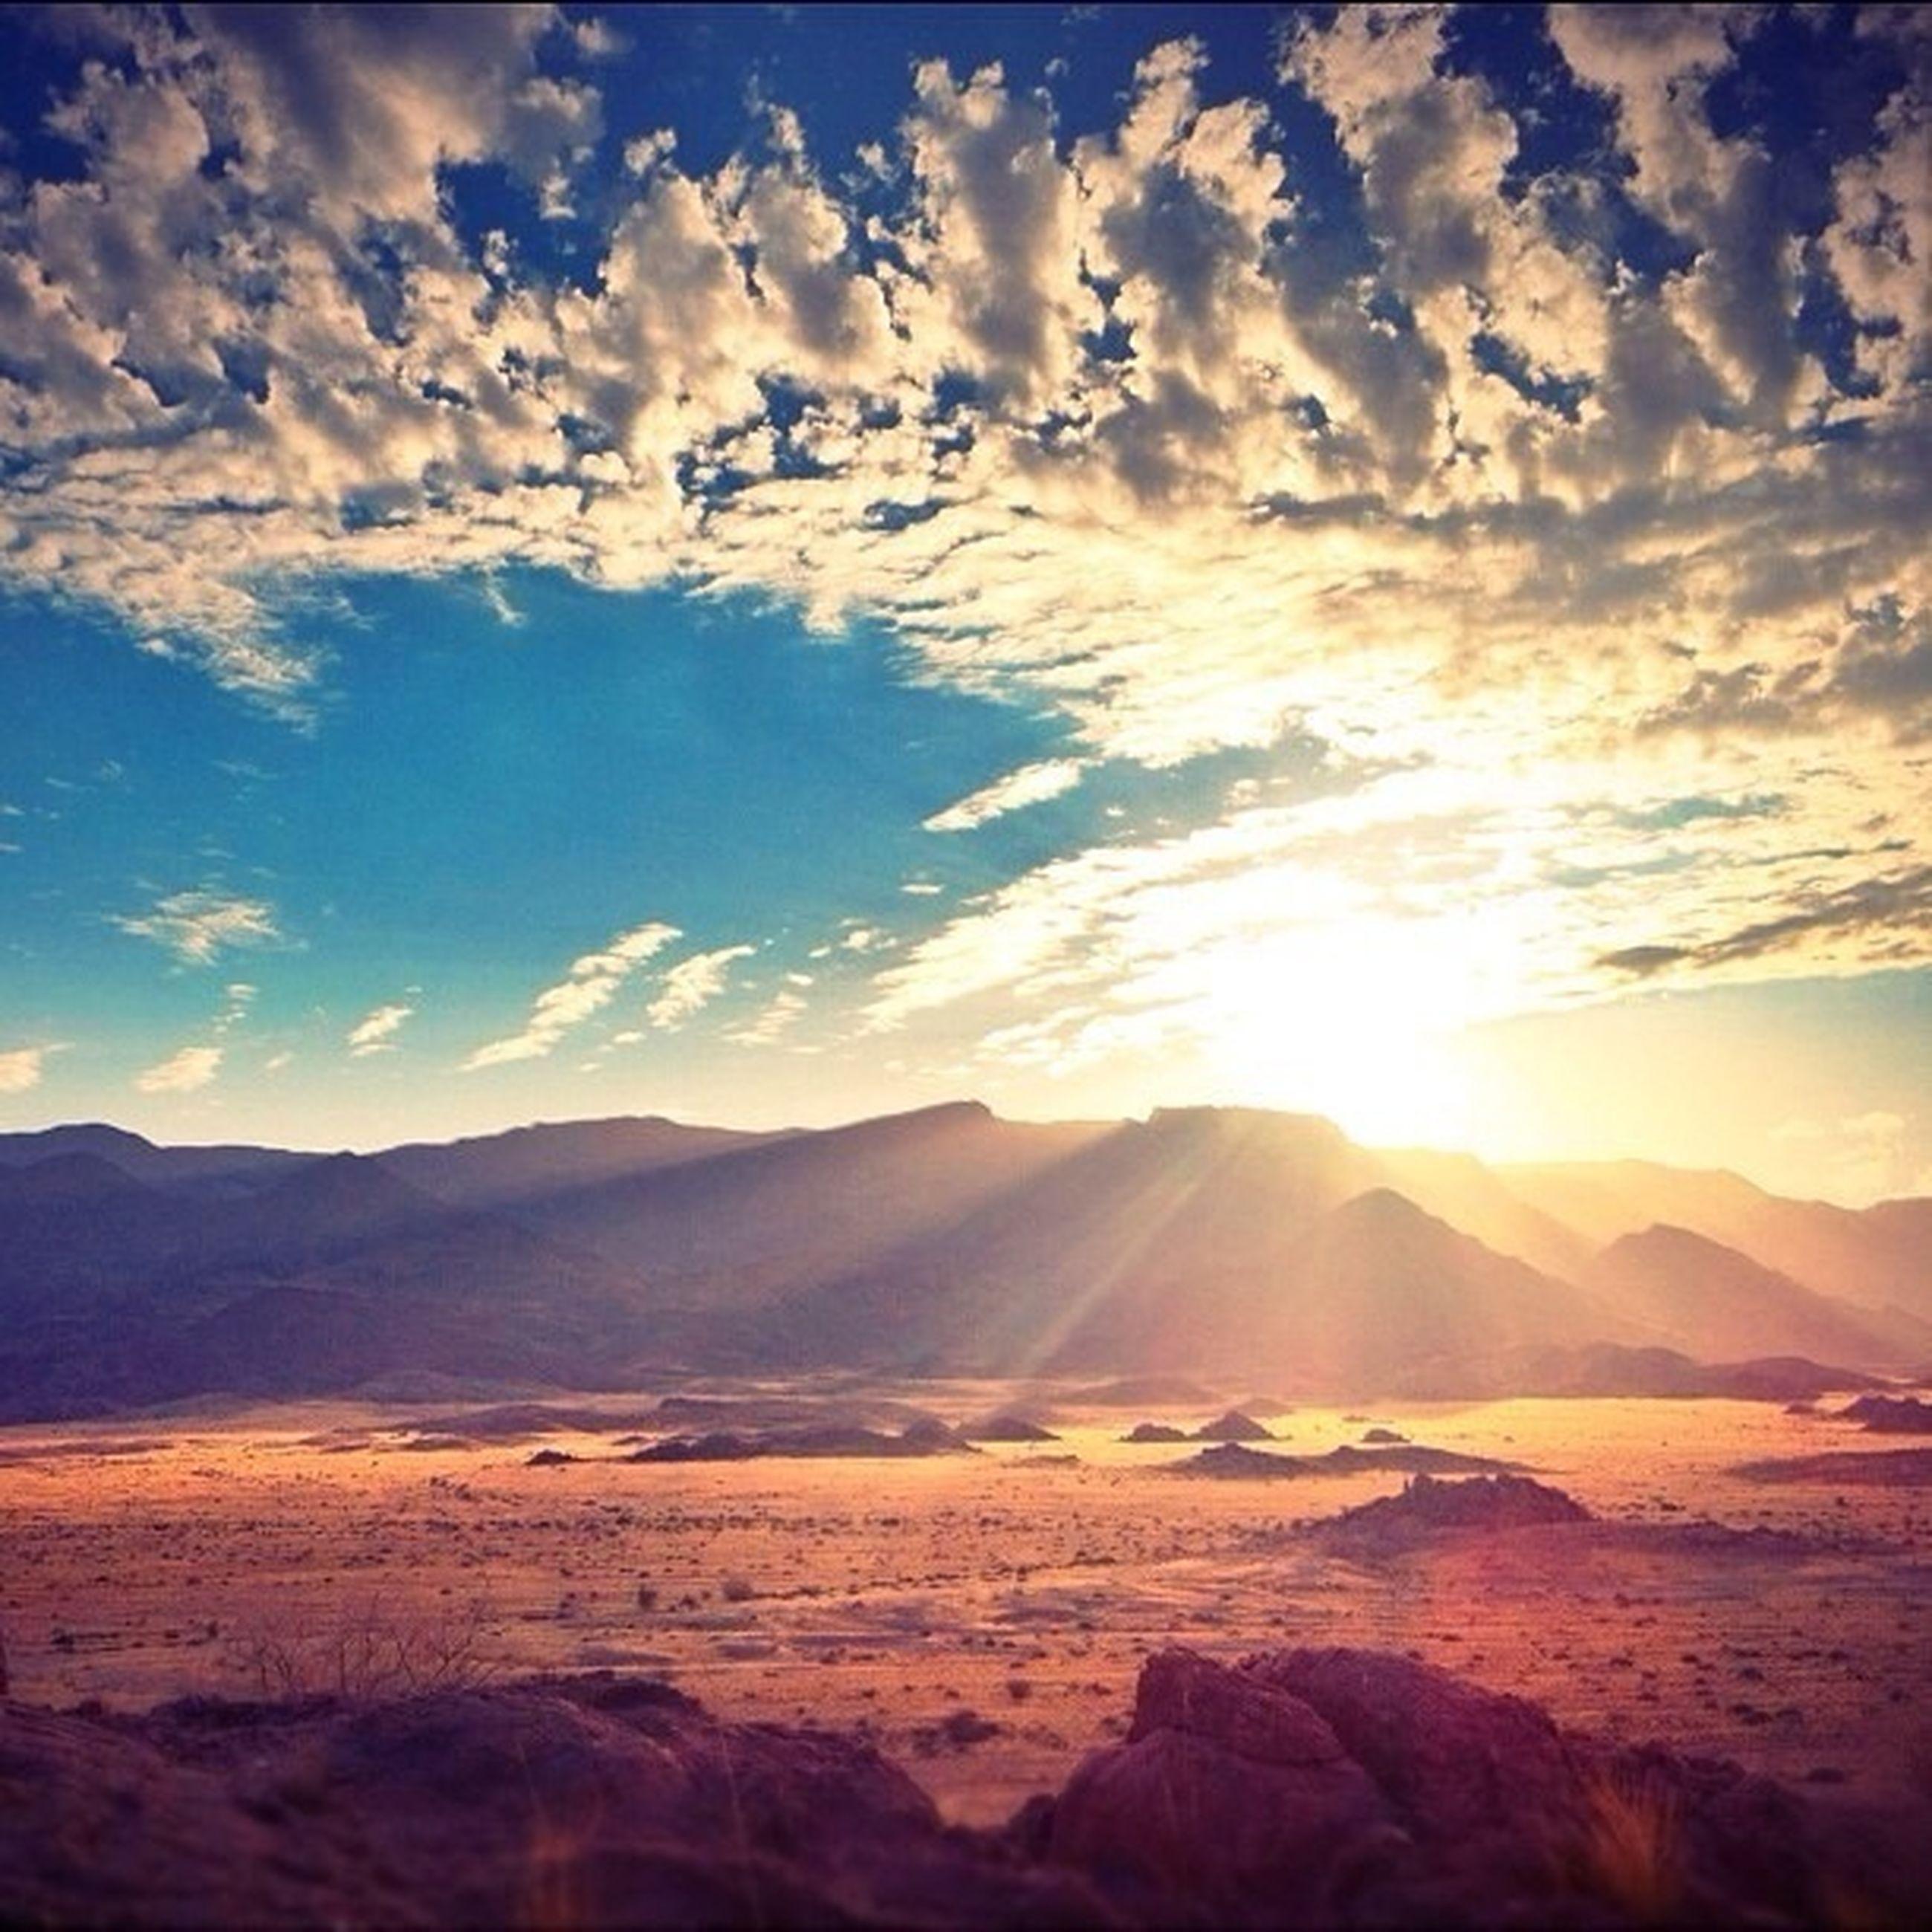 tranquil scene, tranquility, mountain, scenics, landscape, sky, beauty in nature, mountain range, nature, sun, sunlight, cloud - sky, sunbeam, sunset, non-urban scene, cloud, idyllic, remote, physical geography, desert